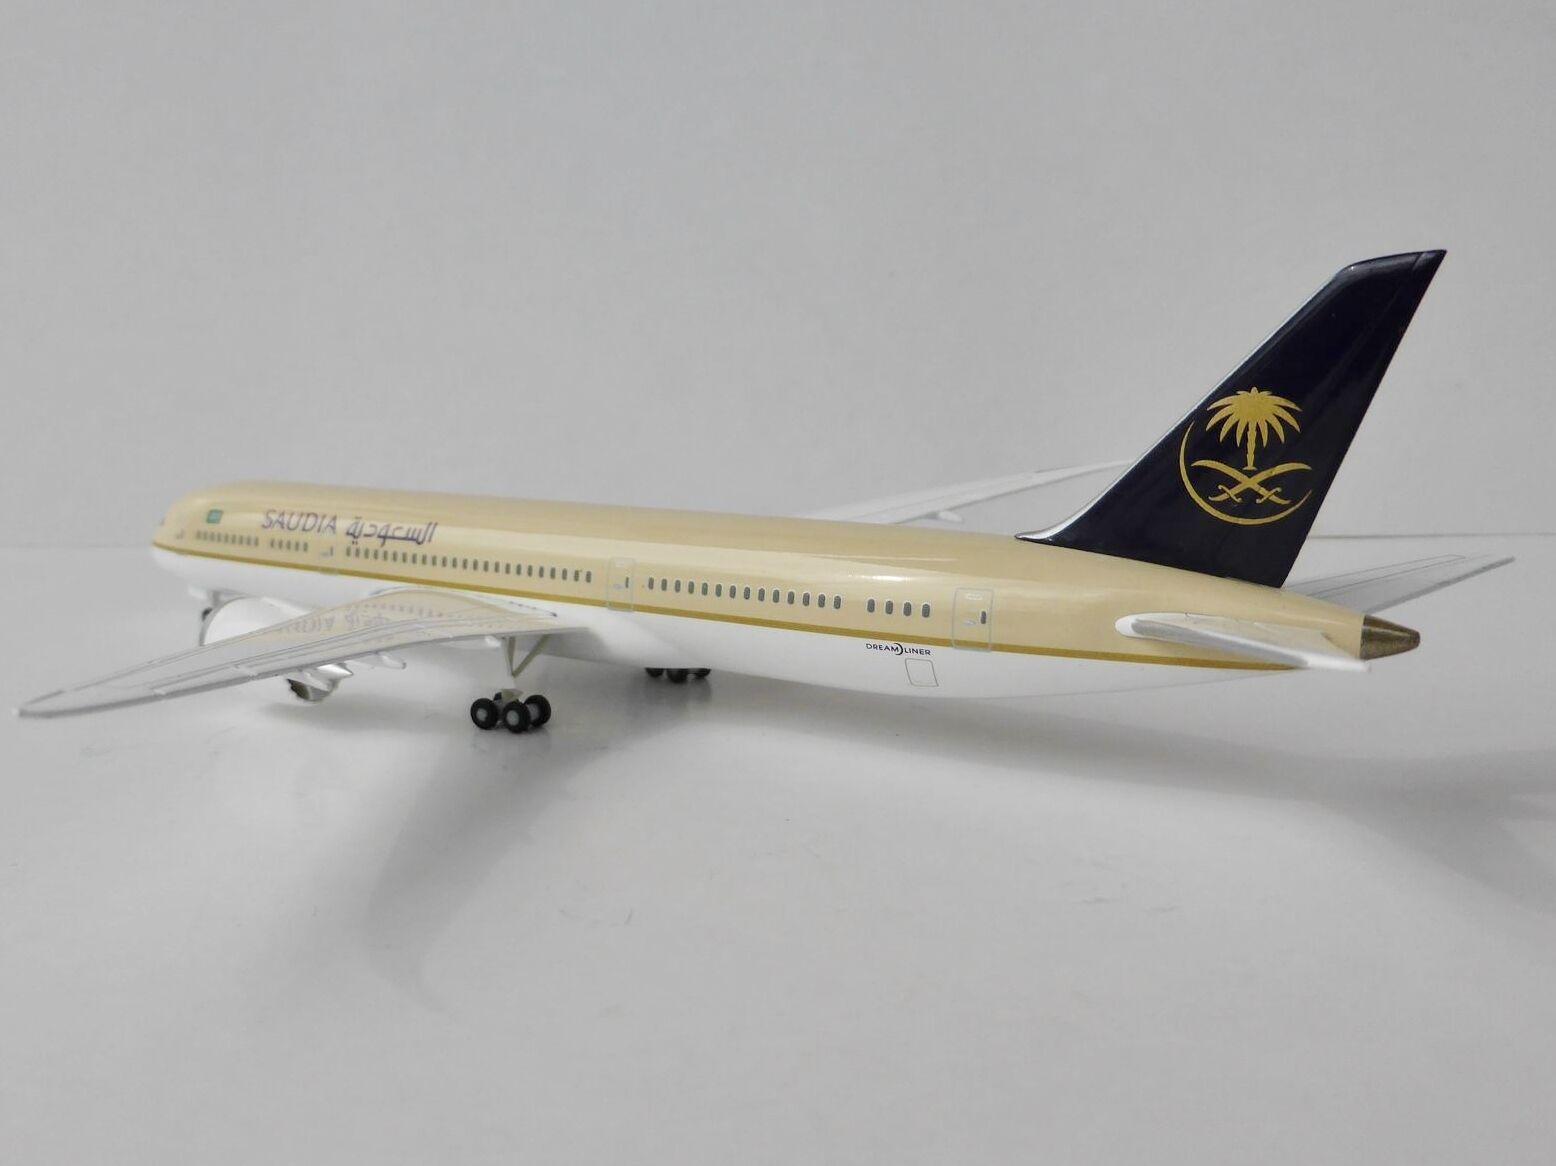 BOEING 787-9 SAUDIA 1 400 Hogan Wings 5156 ON GROUND 787 Saudi Arabian Airlines